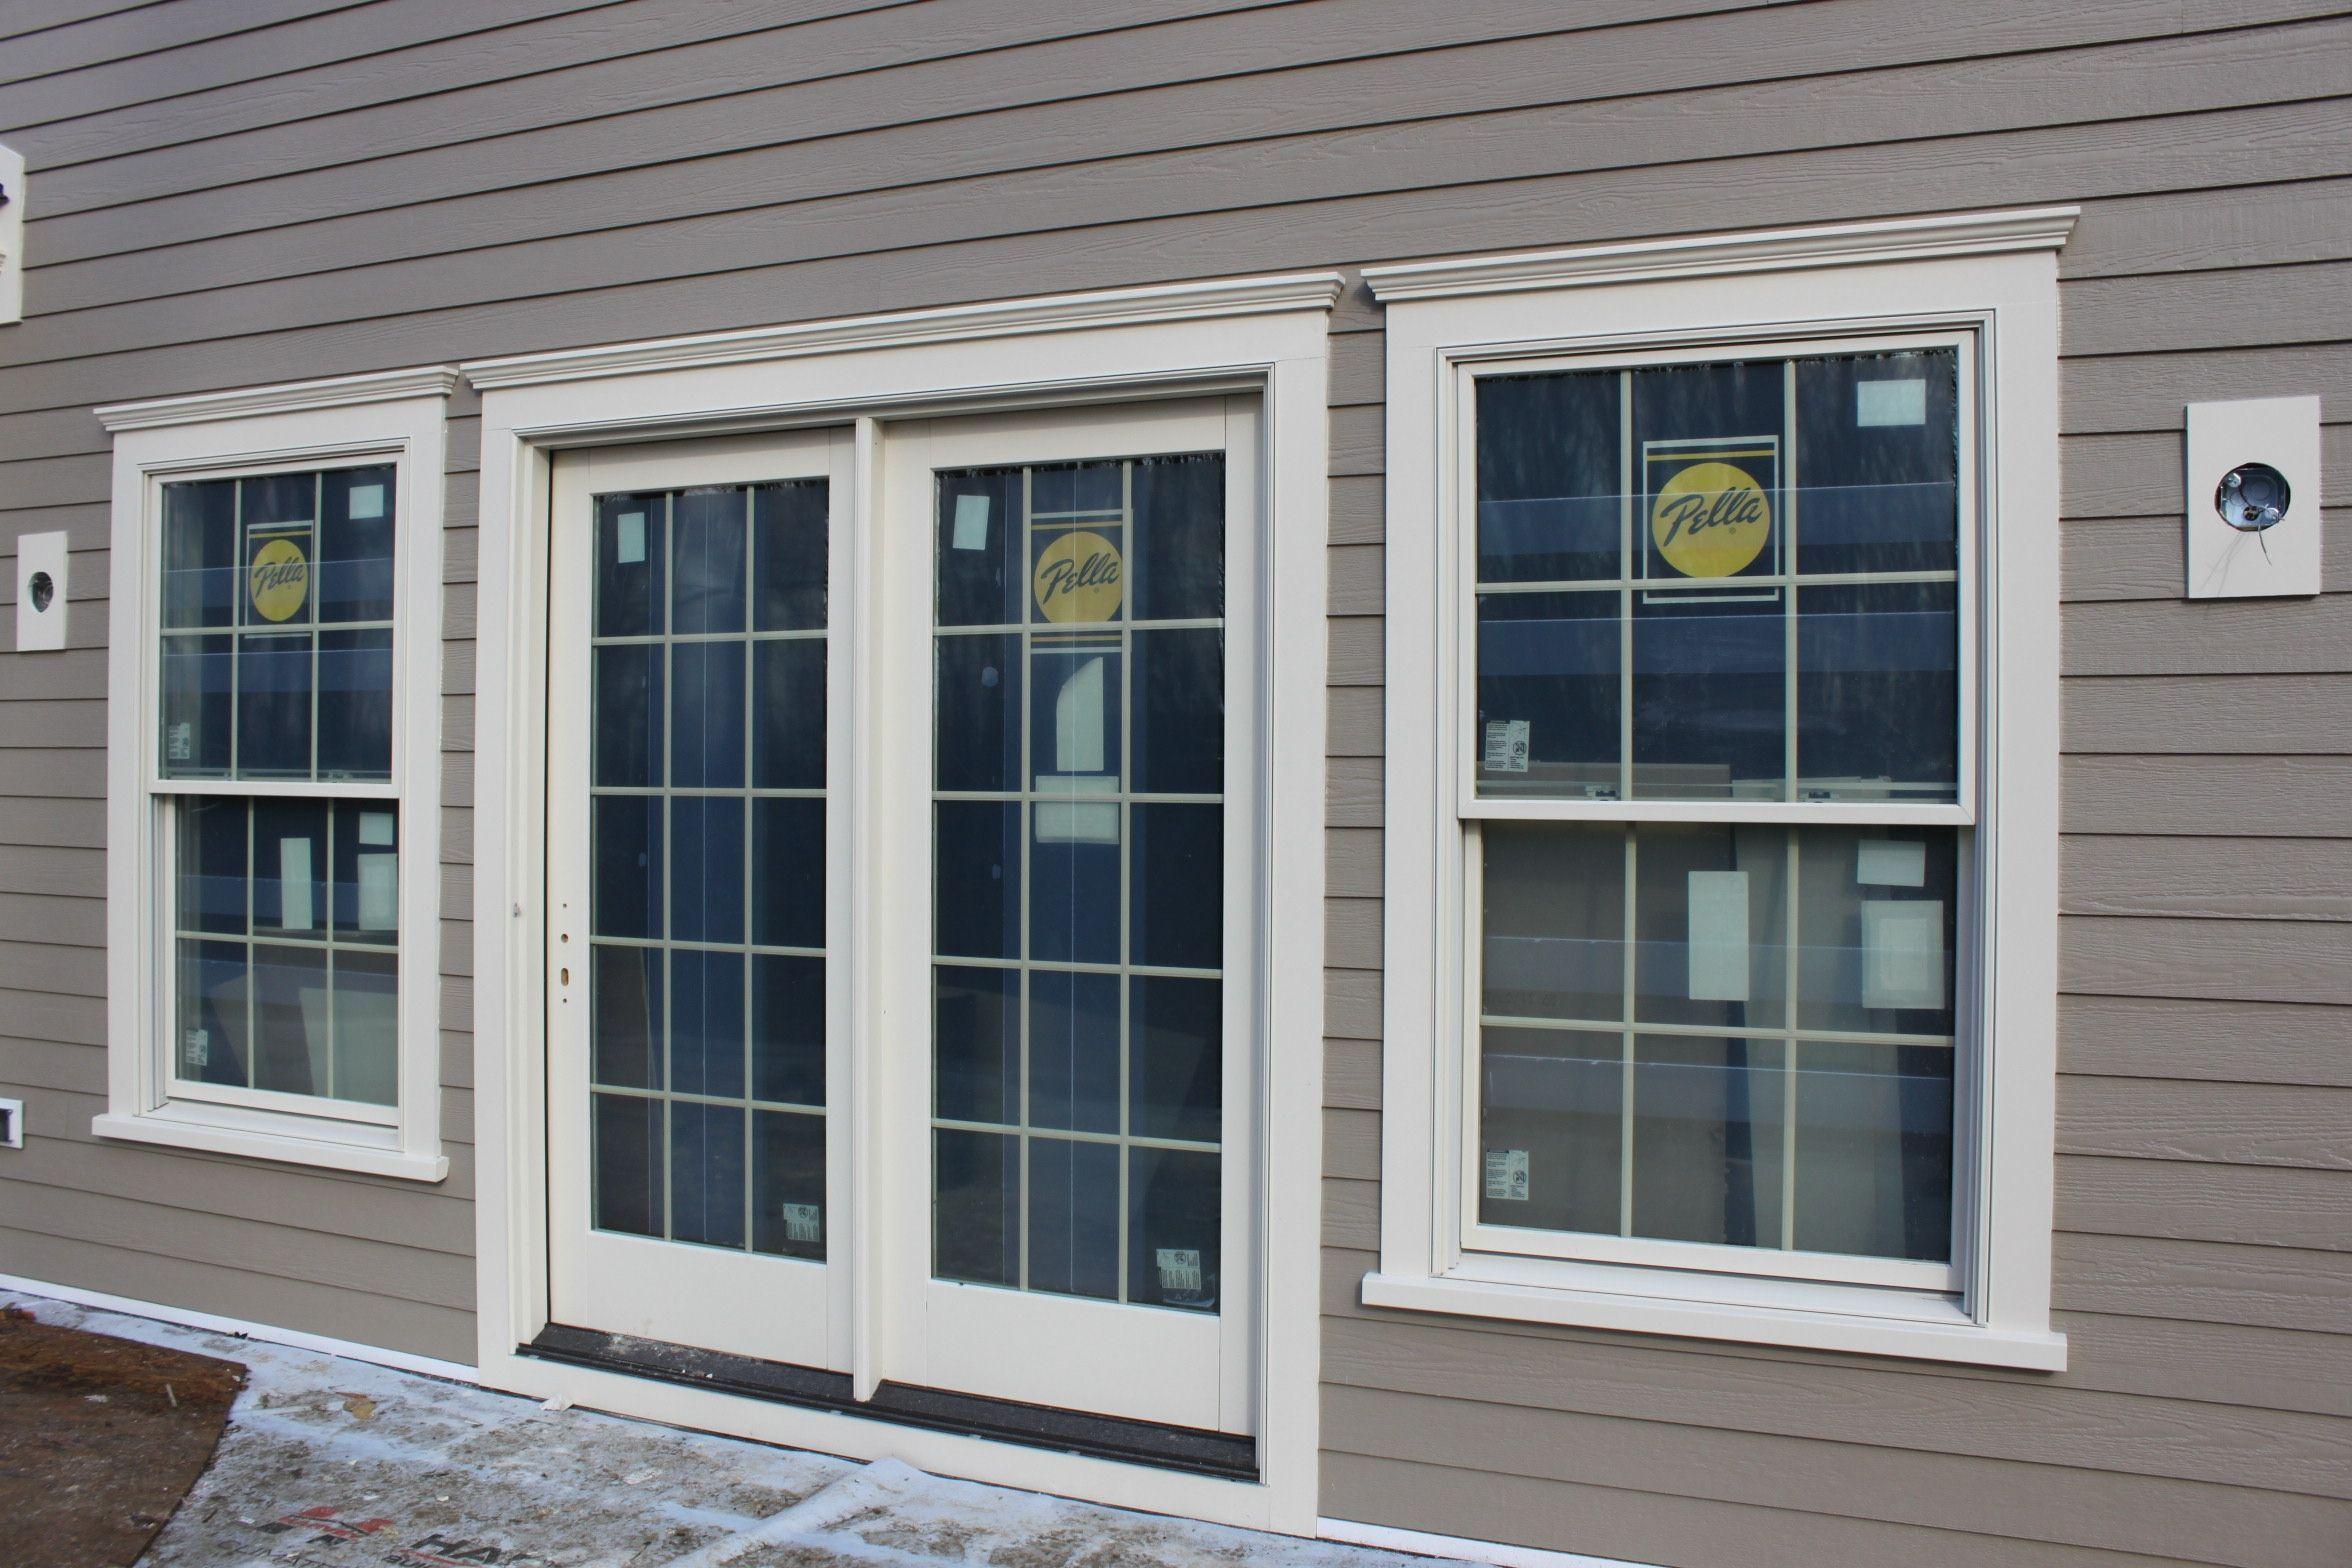 Enticing Houses Then Exterior Design Exterior Window Ideas Pics